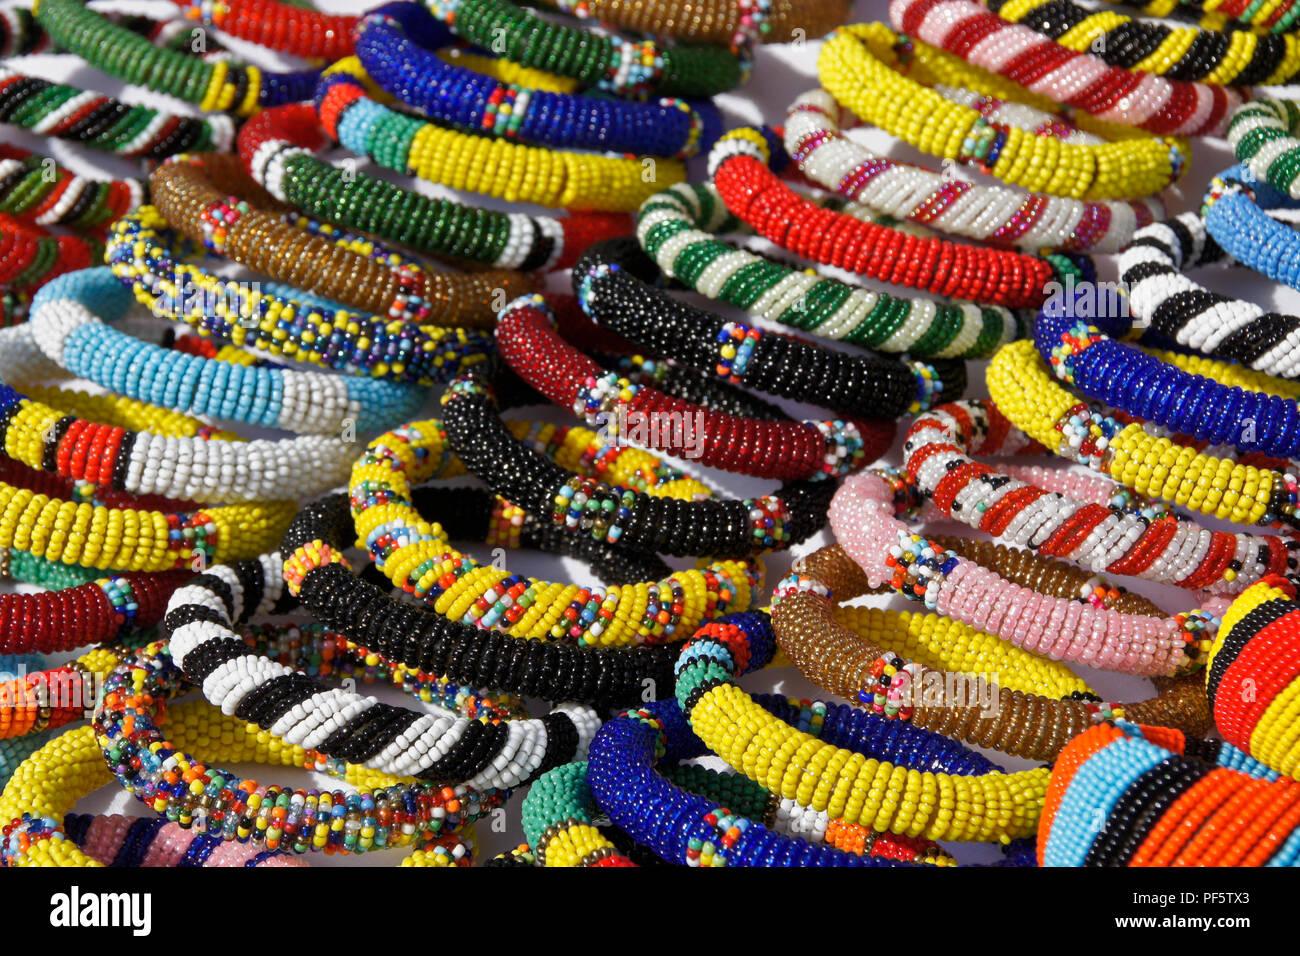 Samburu beaded bracelets for sale at Samburu/Buffalo Springs Game Reserve airstrip, Kenya - Stock Image